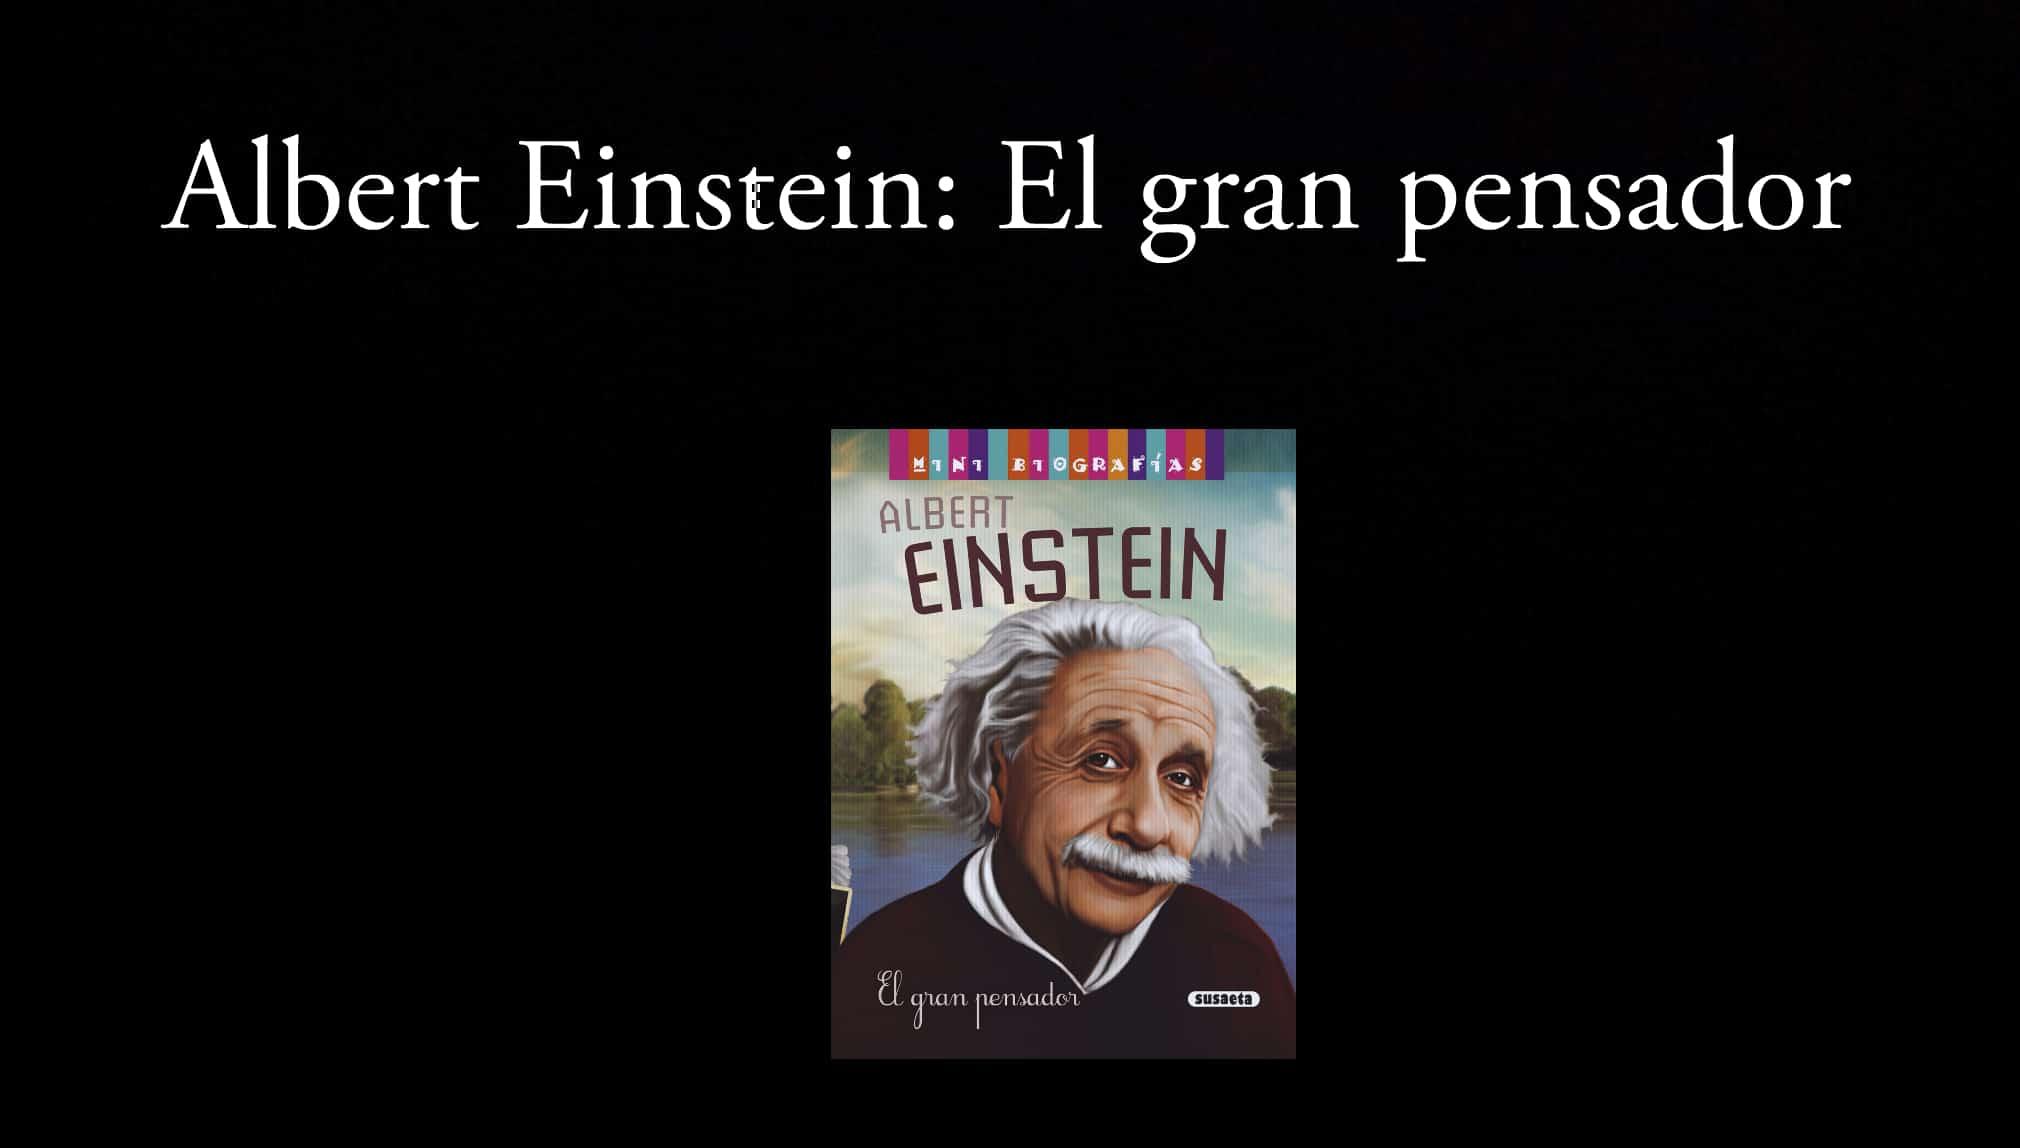 Albert Einstein: El gran pensador.